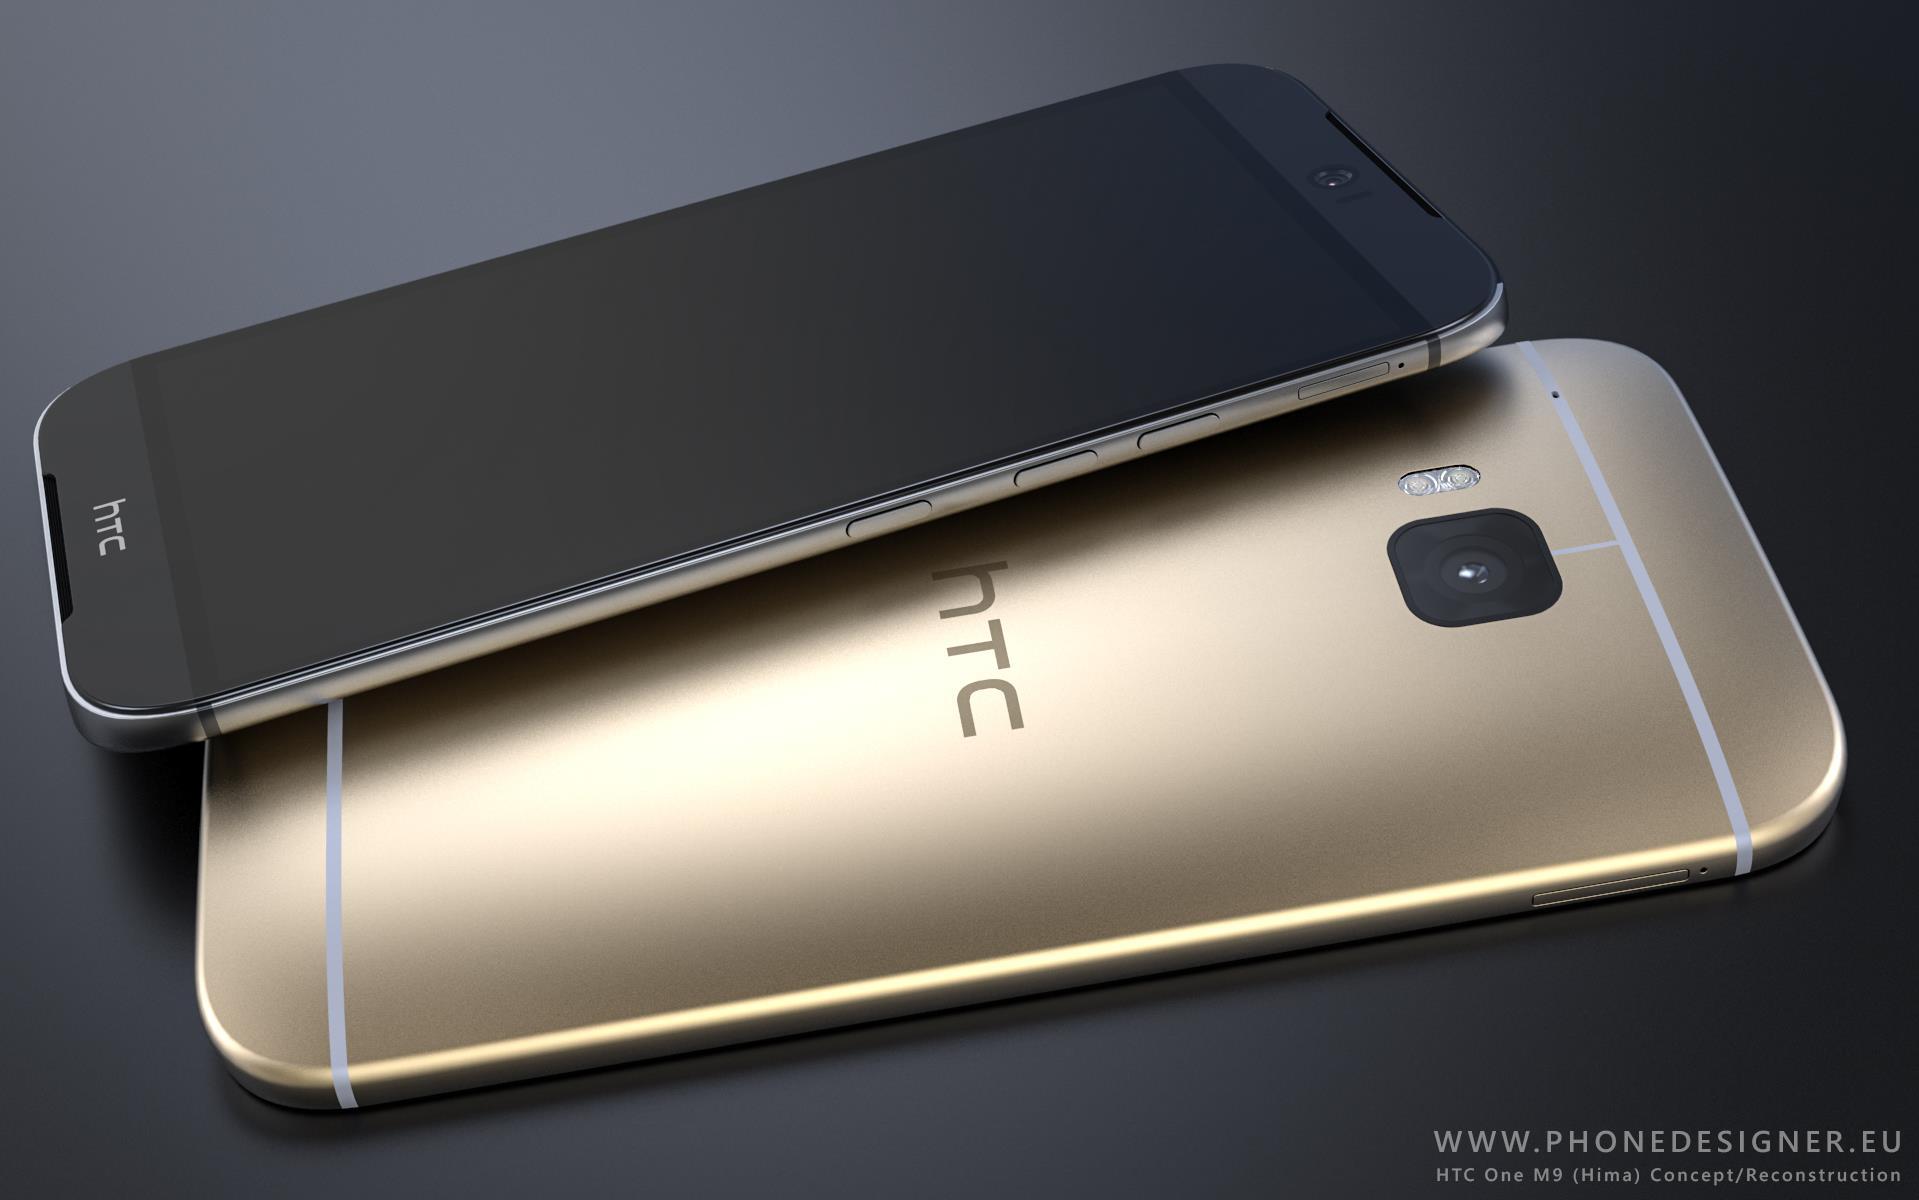 HTC قصد ندارد One M9 plus را در اروپا و آمریکا عرضه کند